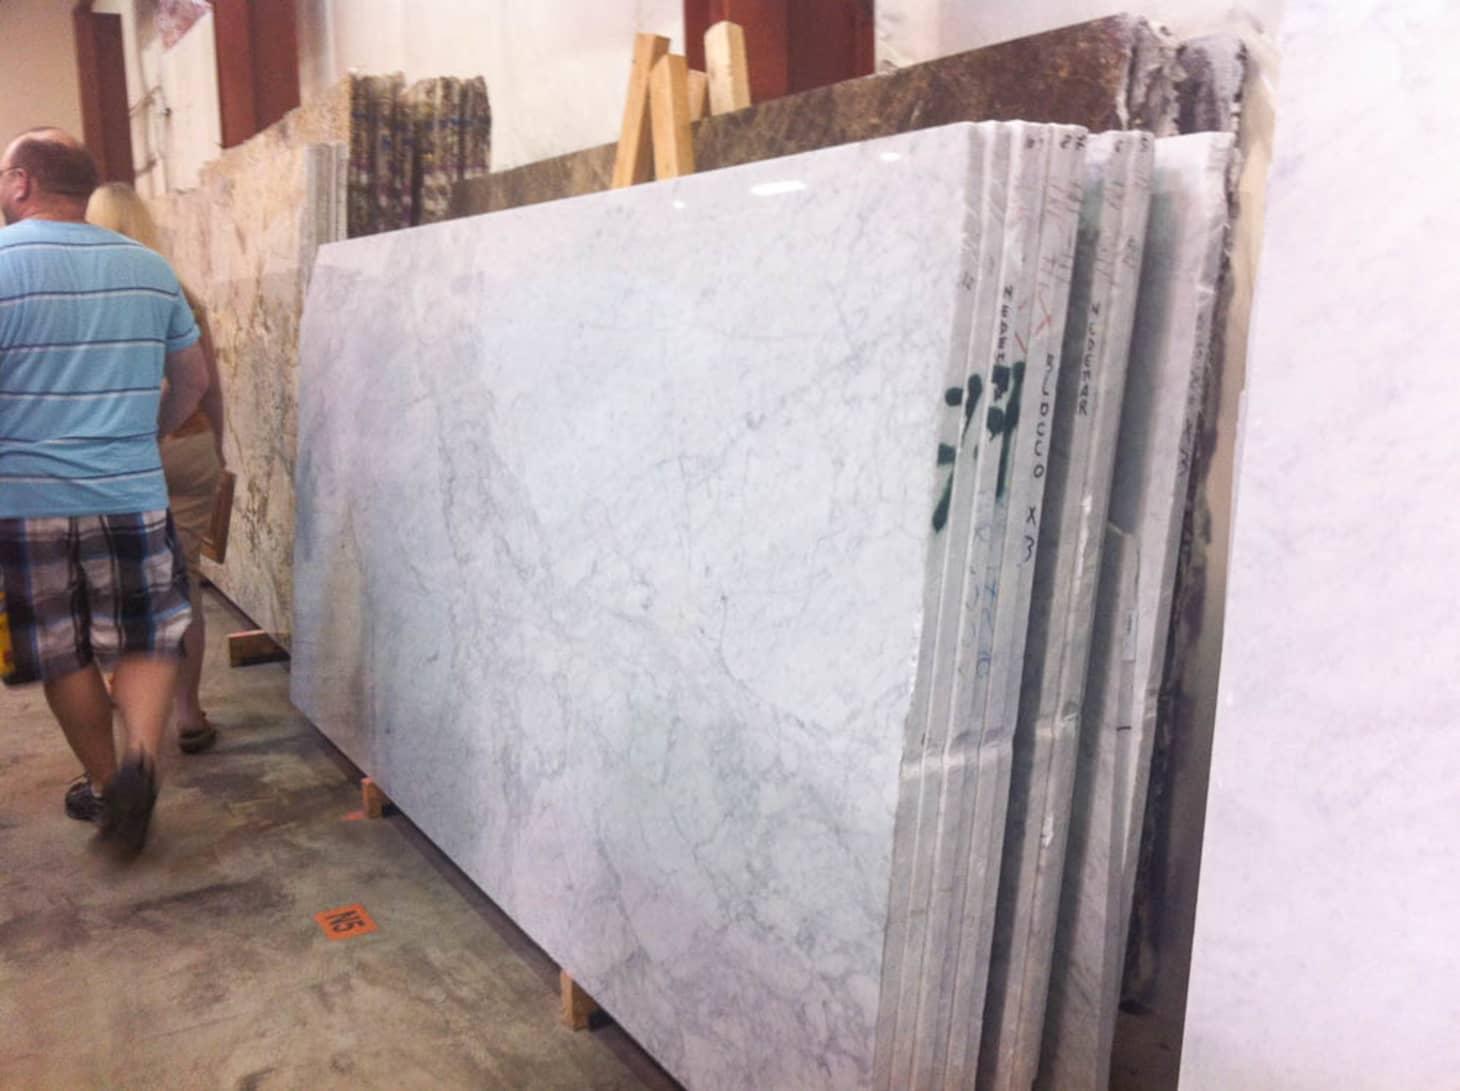 Faith S Kitchen Renovation How We Finally Got Our Carrara